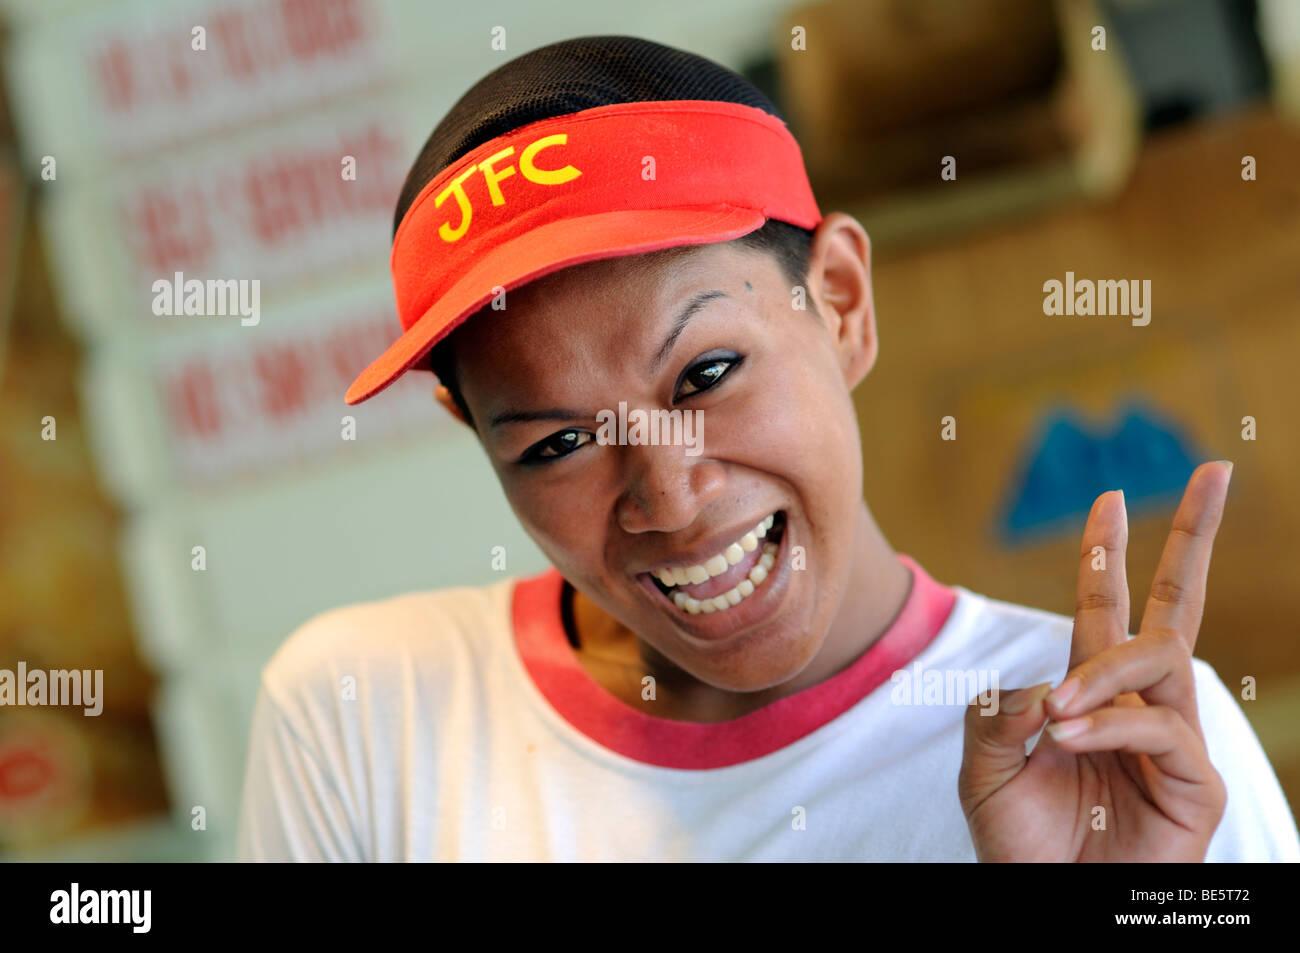 fast food worker davao city davao del norte mindanao philippines - Stock Image